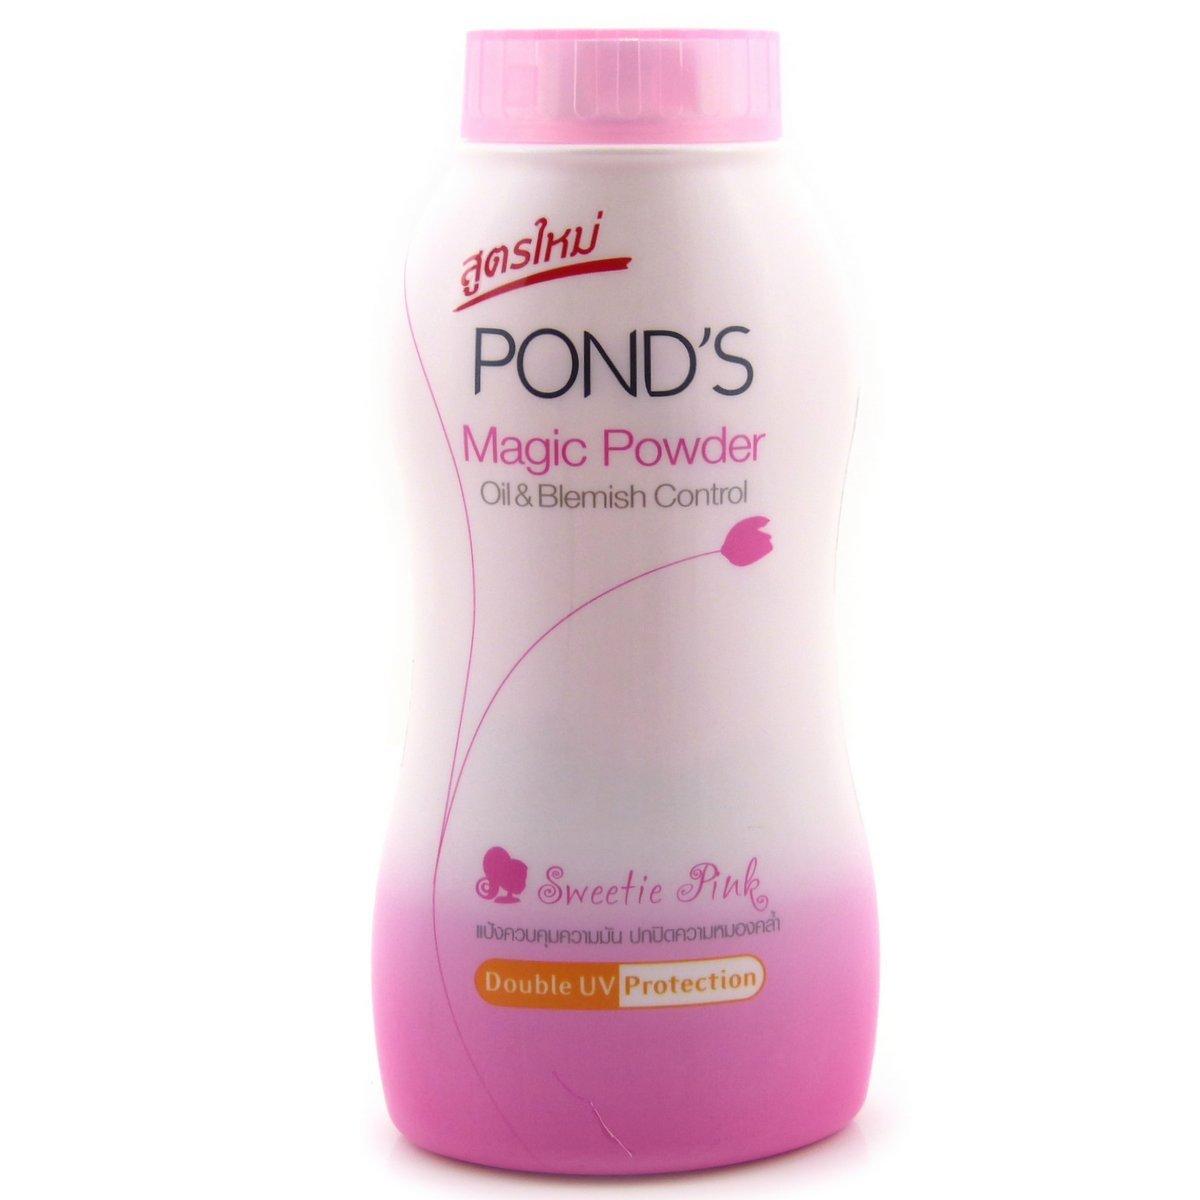 Ponds Powder Logo Pond's Magic Powder Oil